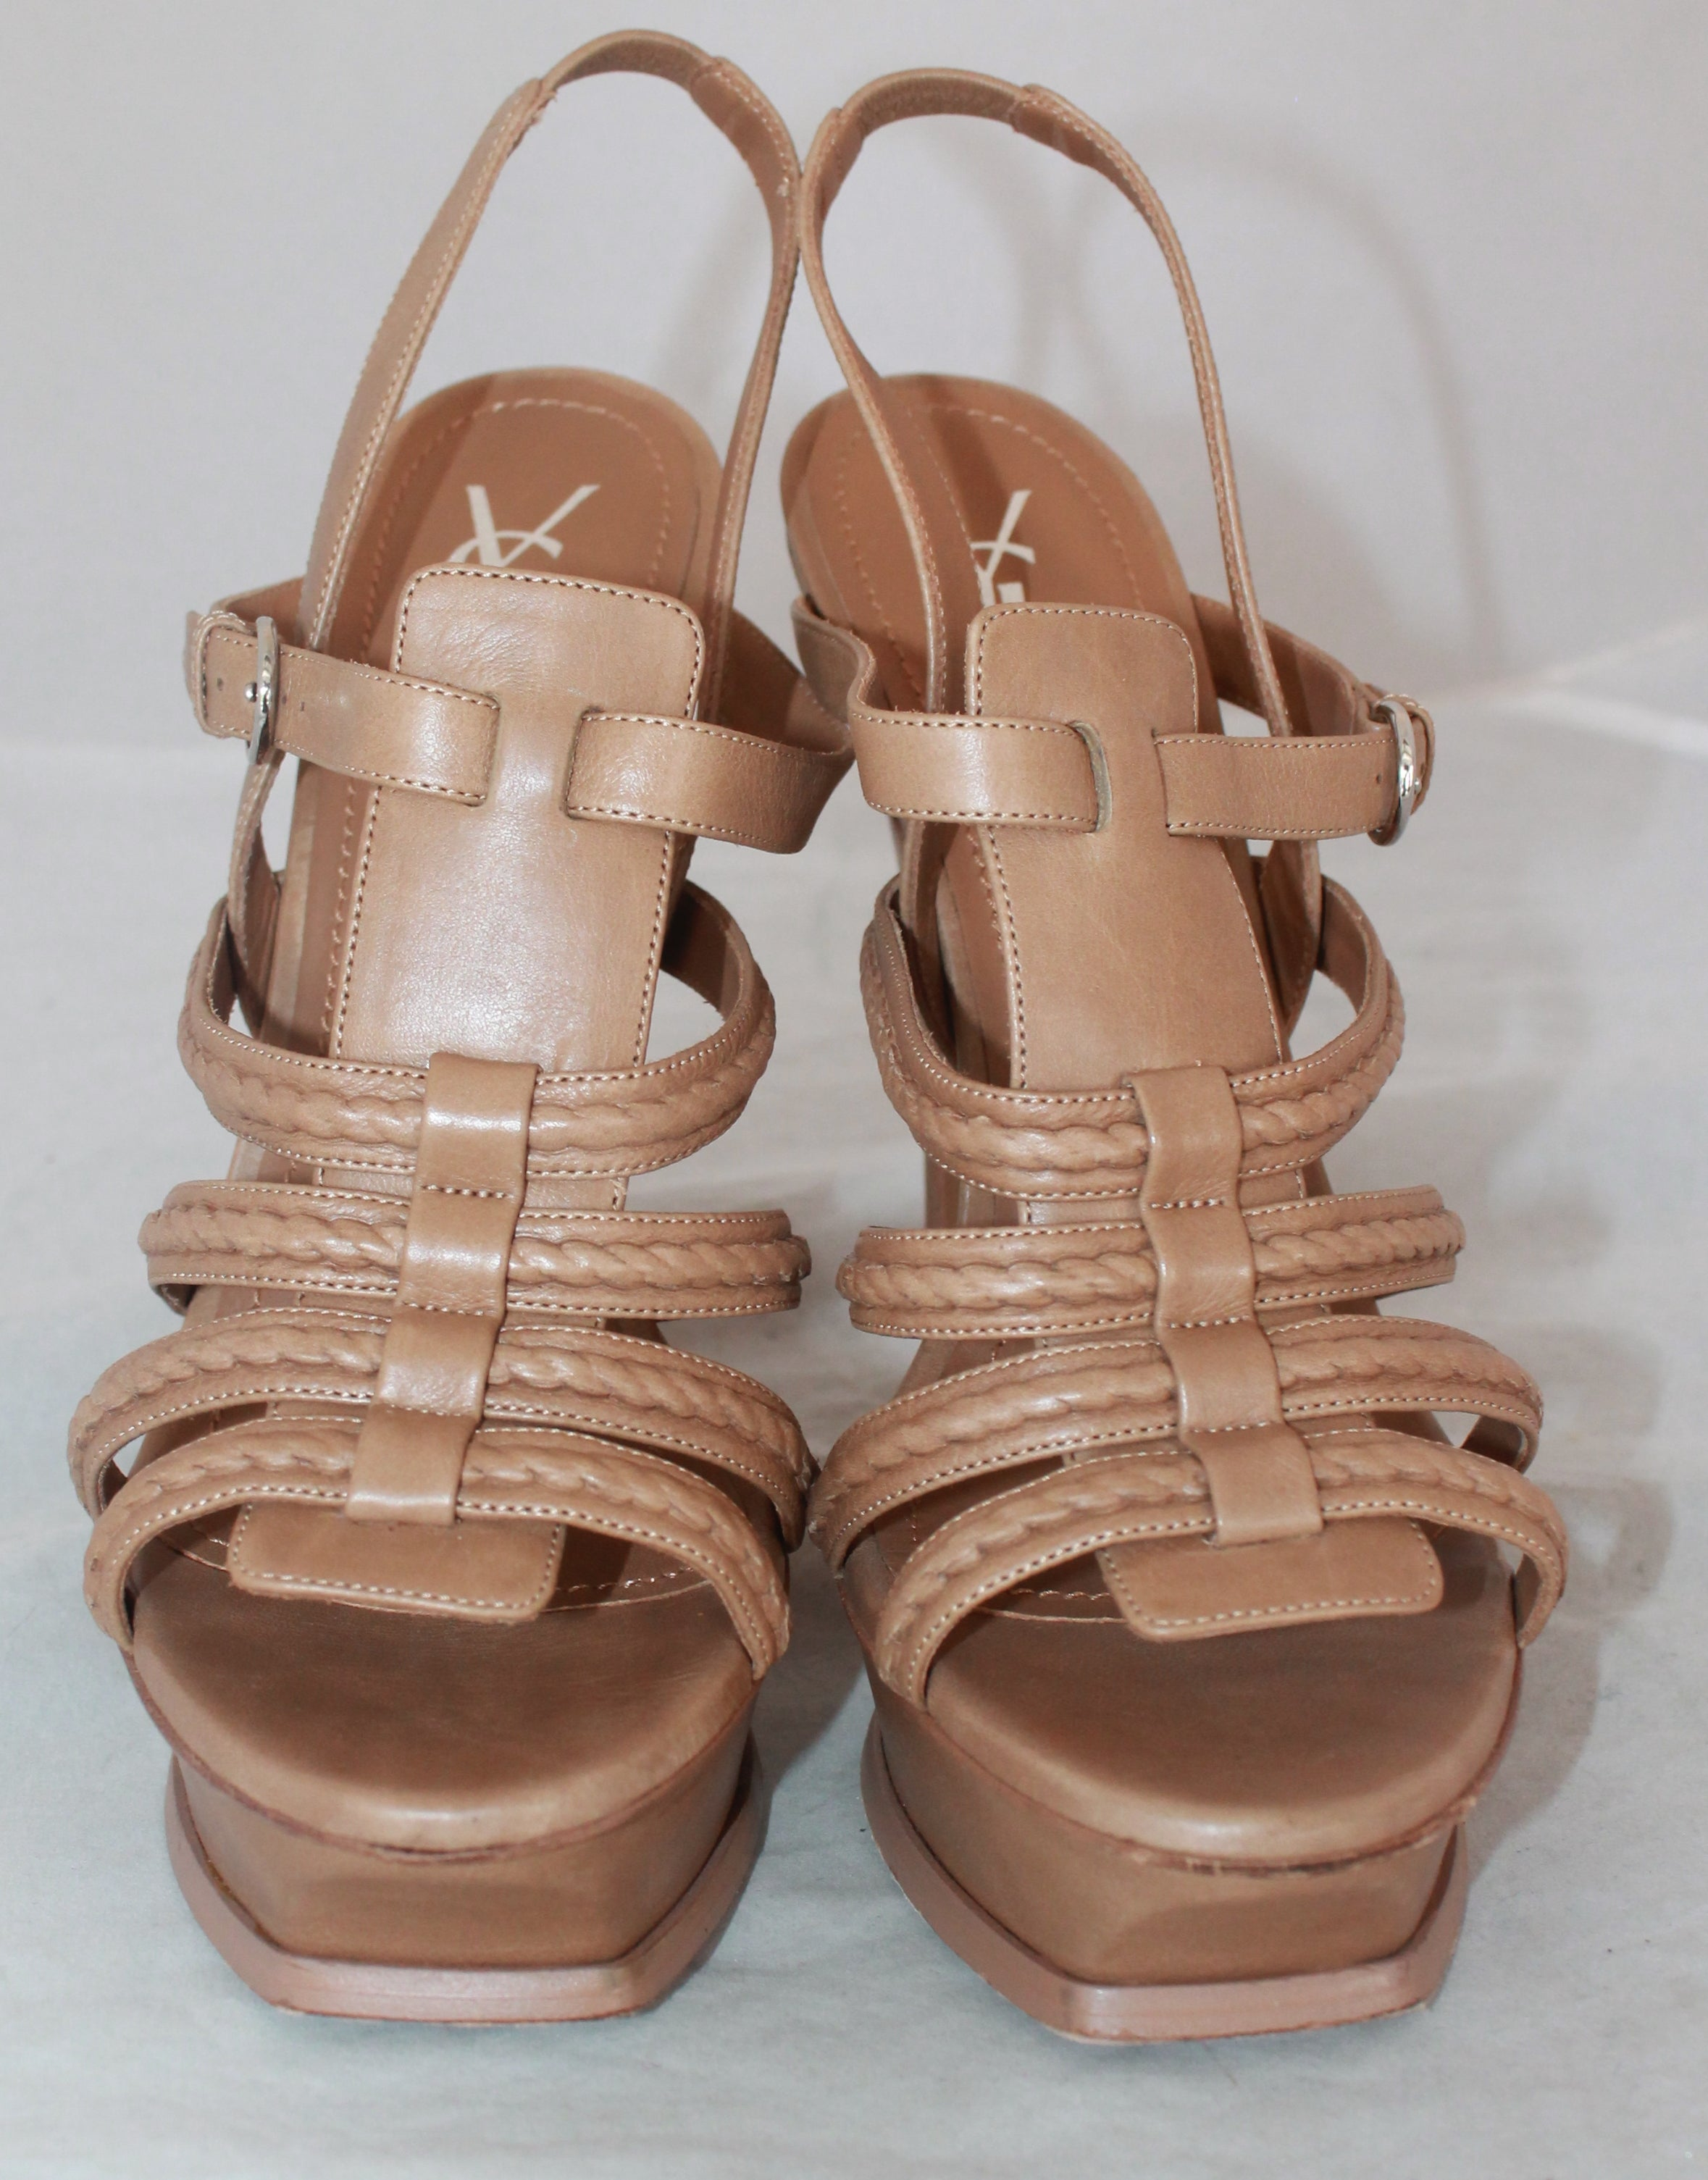 3e6055c1e90 YSL Tan Leather Strappy Platform Heel w  Slingback Strap - 41 For Sale at  1stdibs